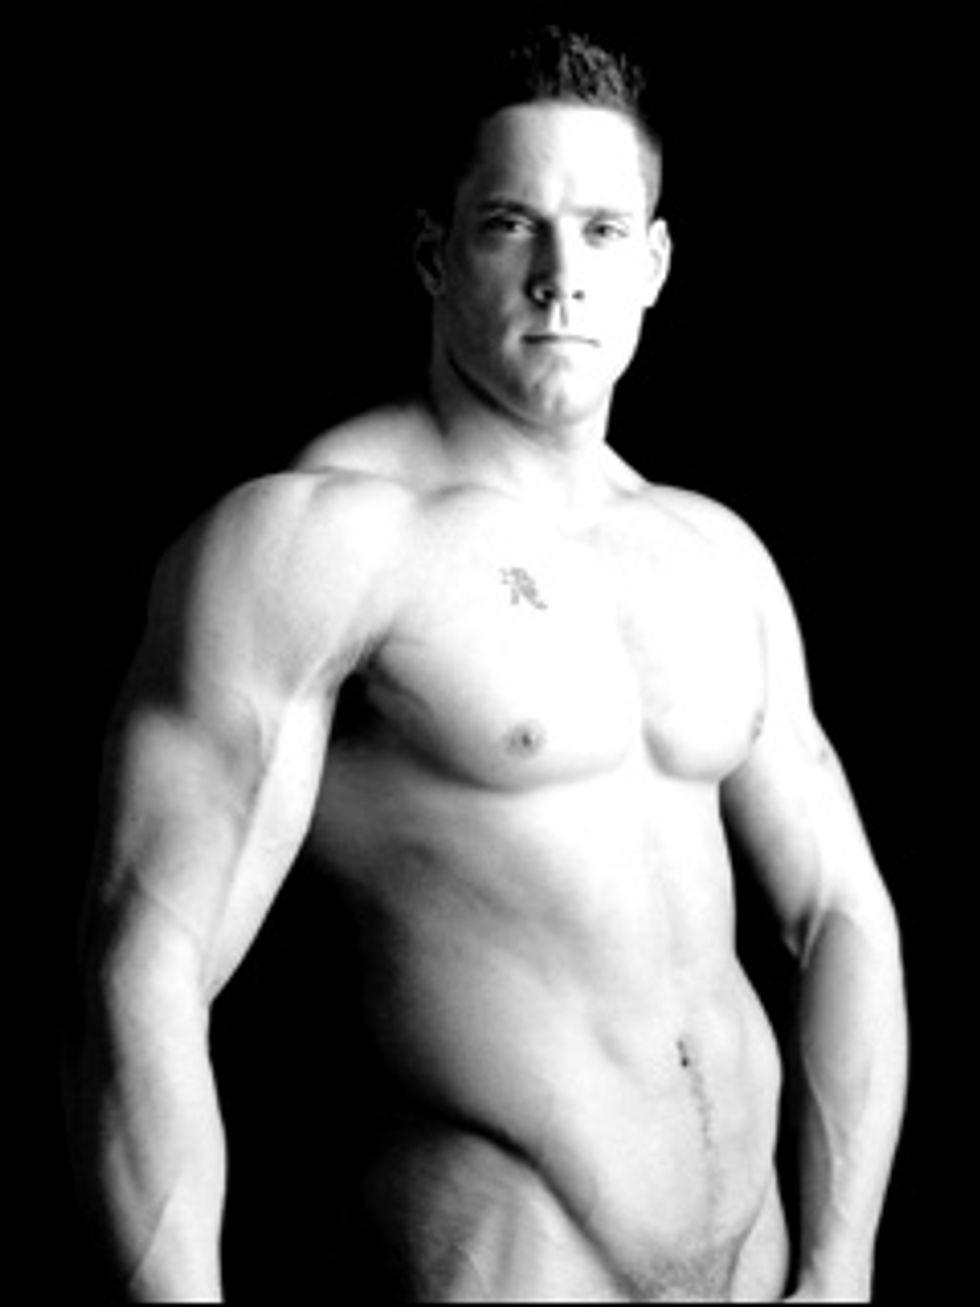 R.I.P. Adult Film Star Erik Rhodes